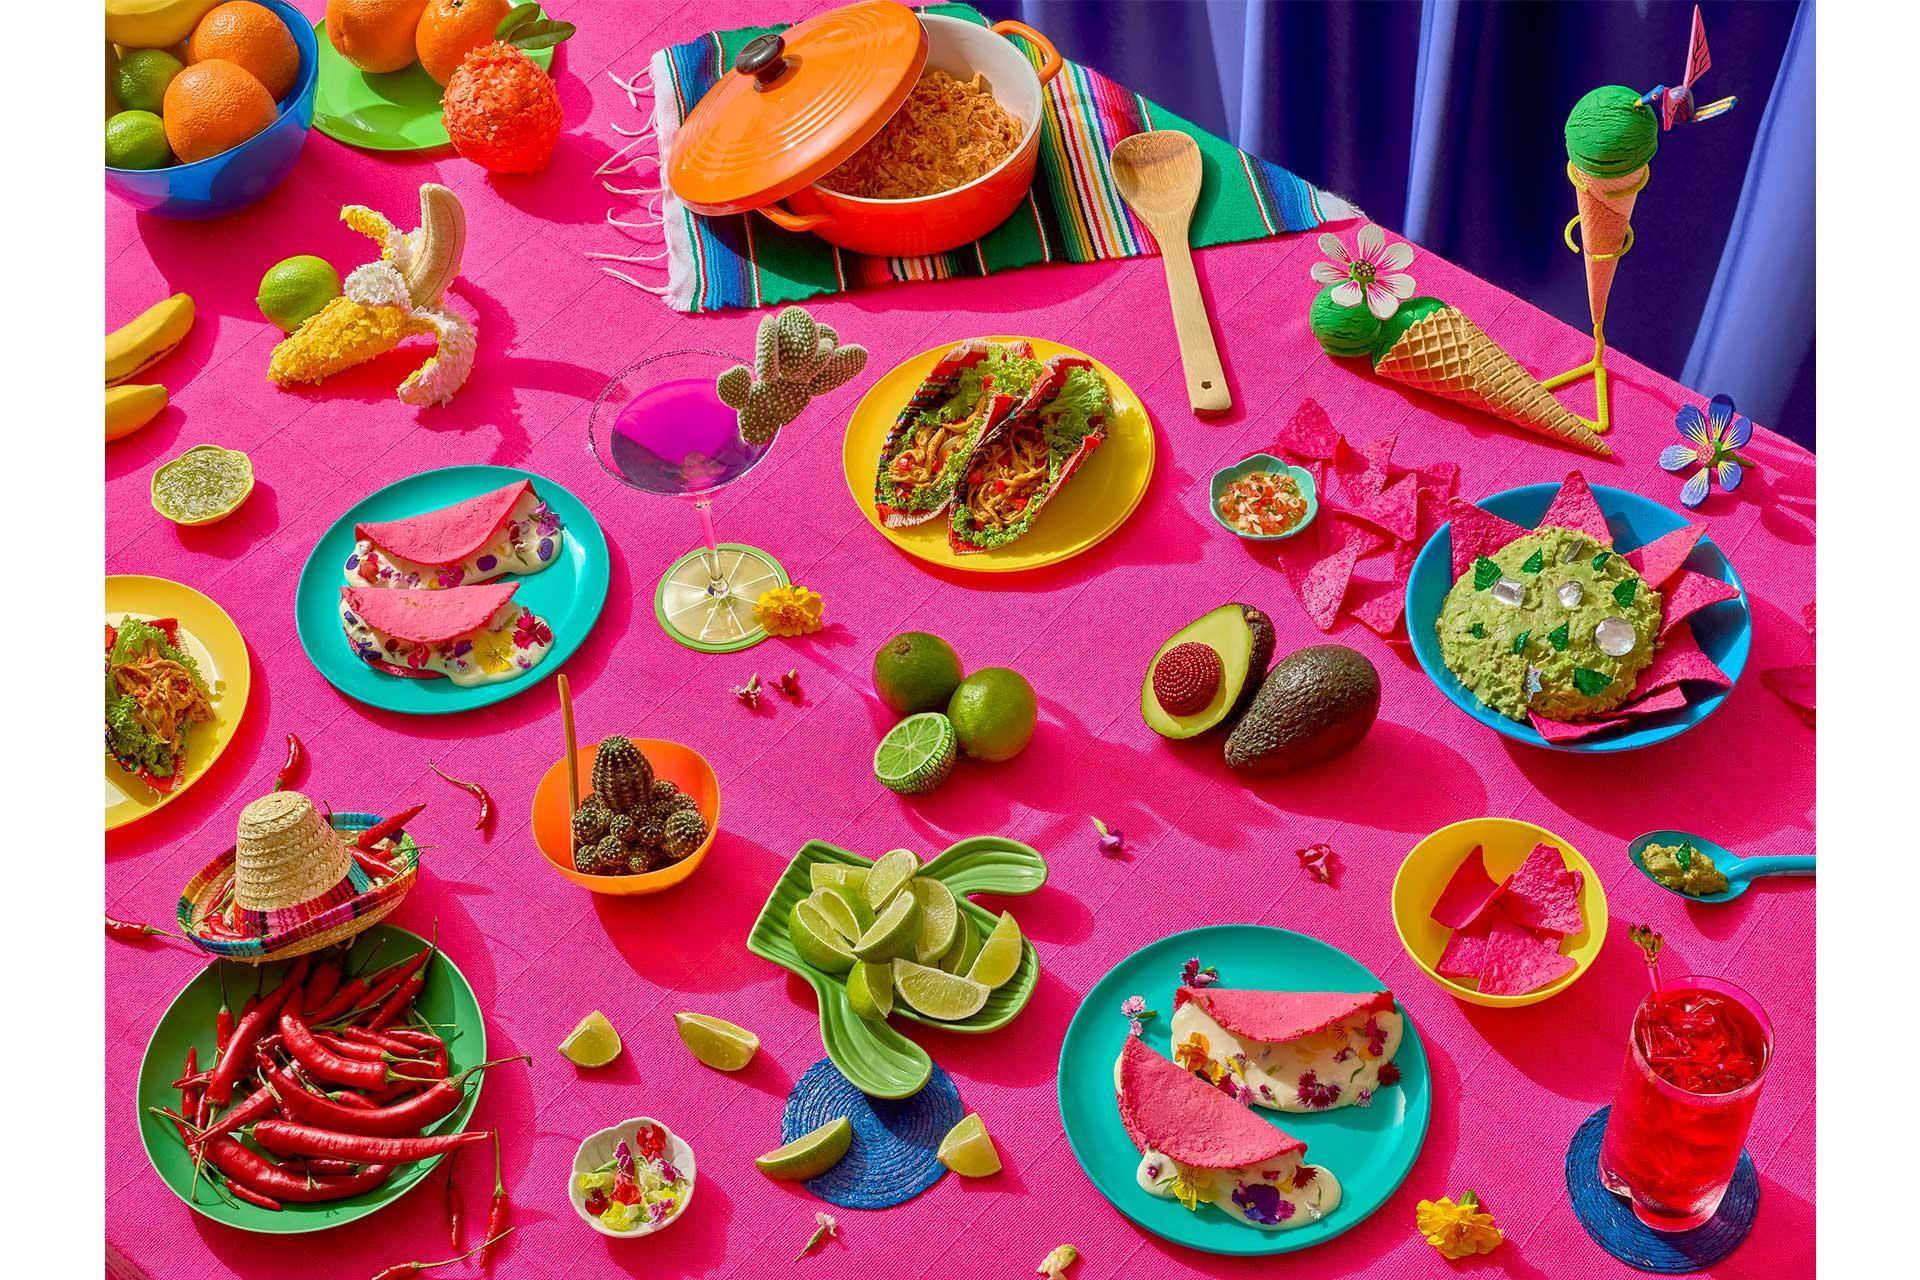 Pink Meal Paloma Rincon